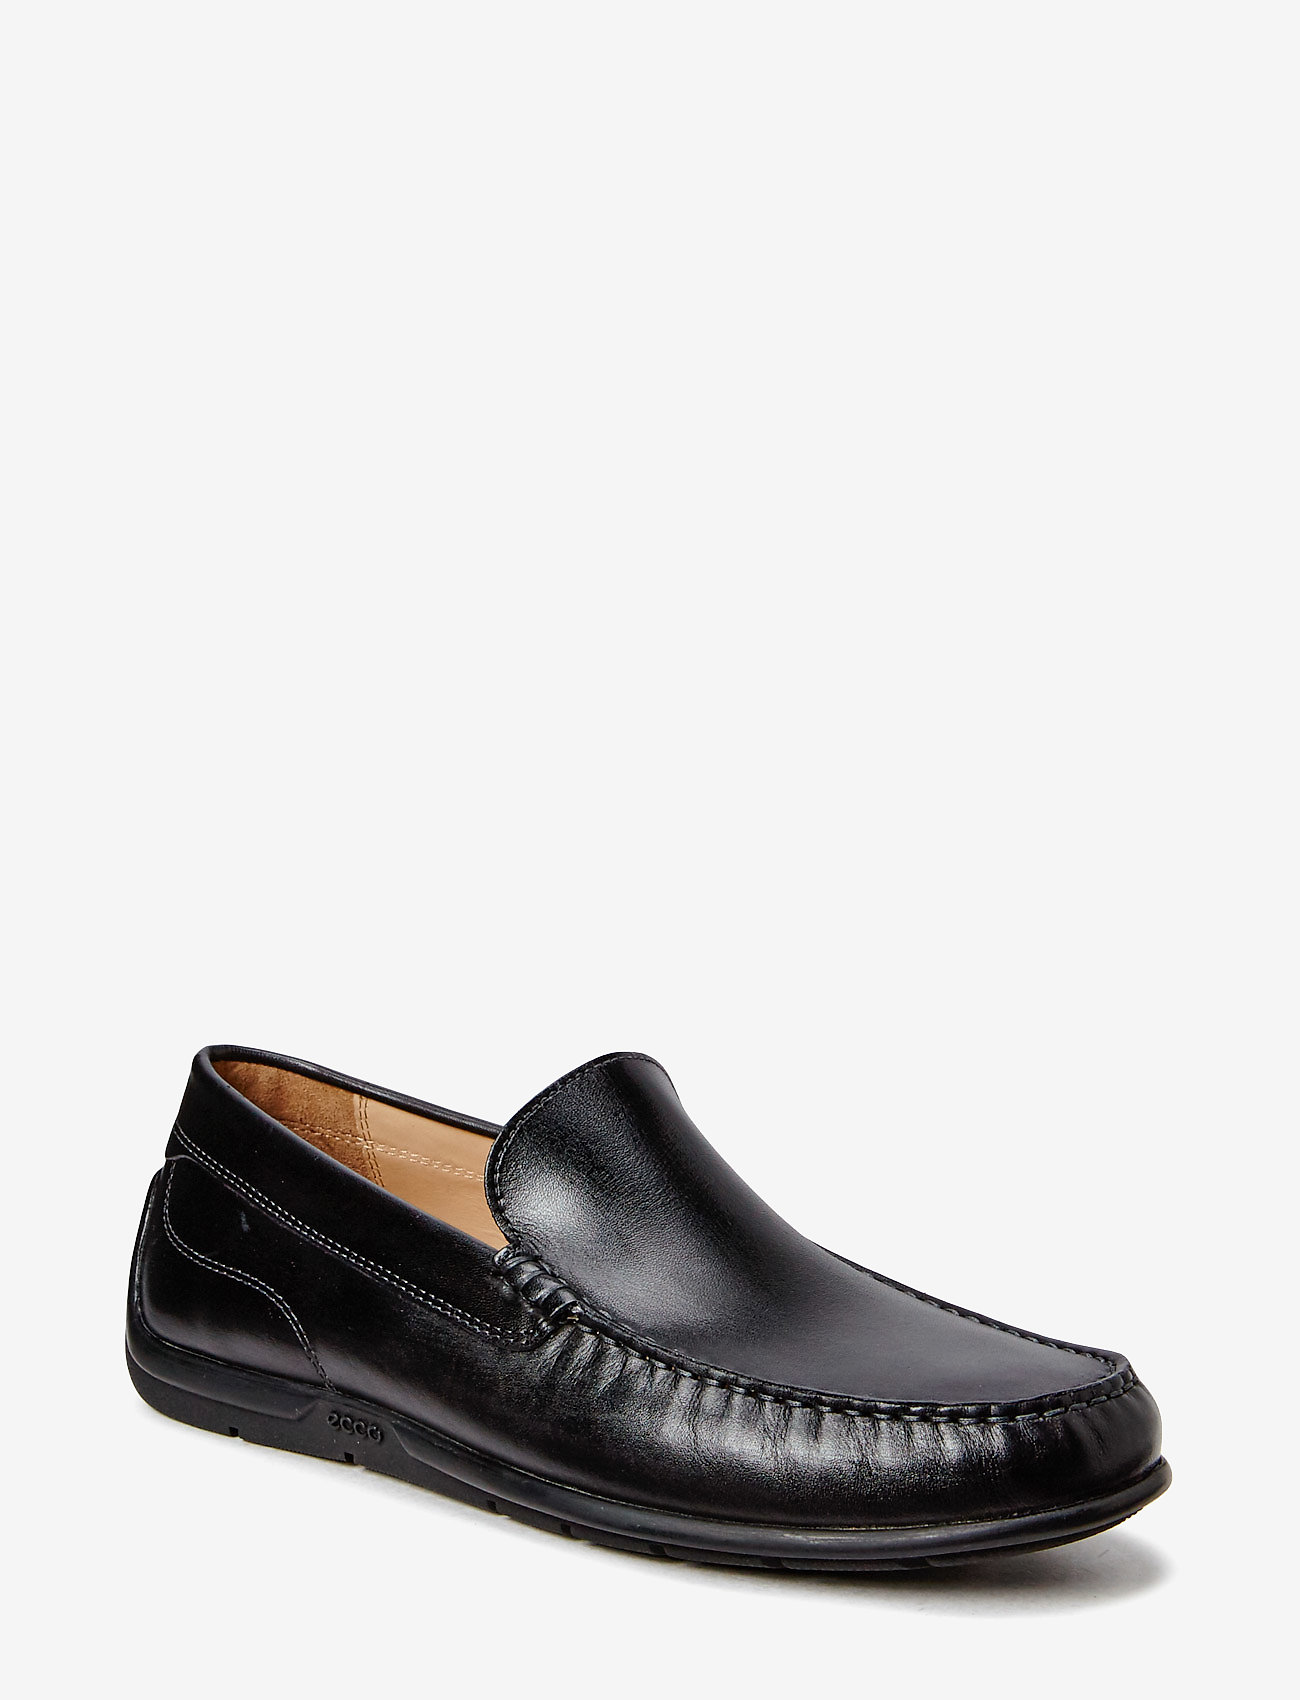 Ecco Classic Moc 2.0 - Loafers Black